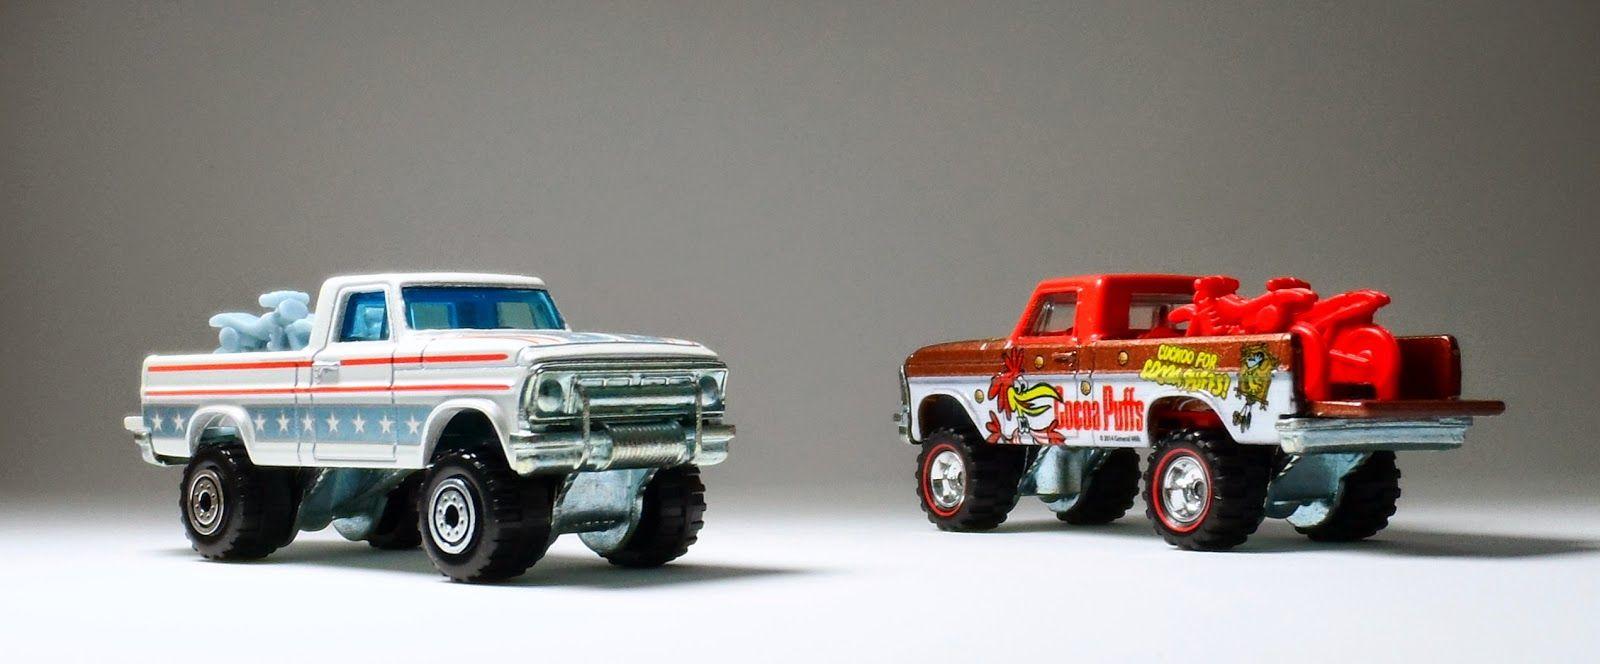 Ford F-100 (Texas Drive 'Em) - Hot Wheels